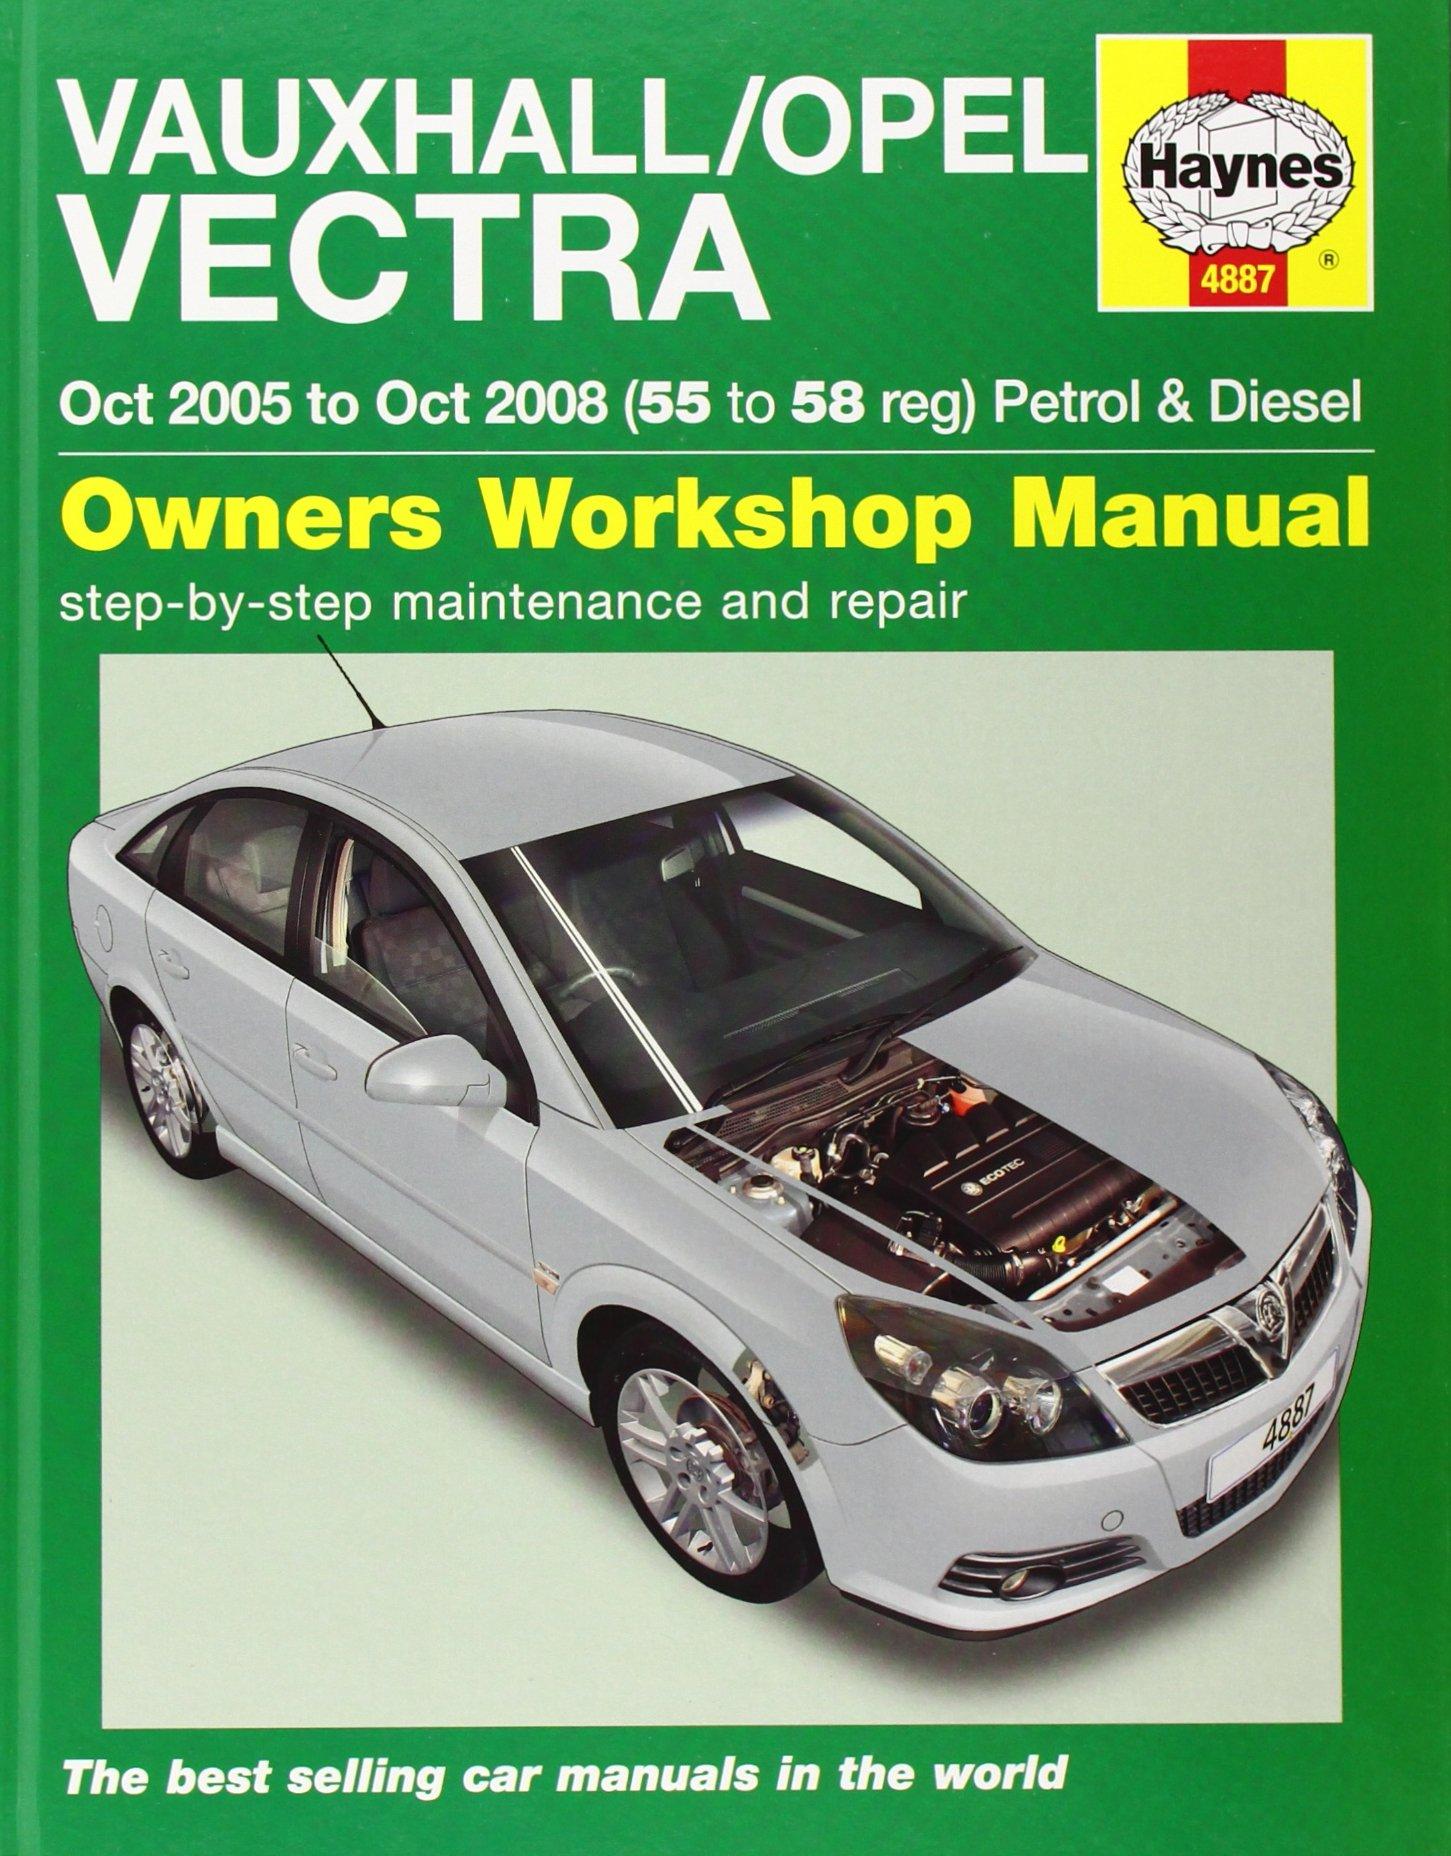 vauxhall opel vectra petrol diesel service and repair manual oct rh amazon com Haynes Manuals for 2003 Jeep Haynes Manuals for 2003 Jeep